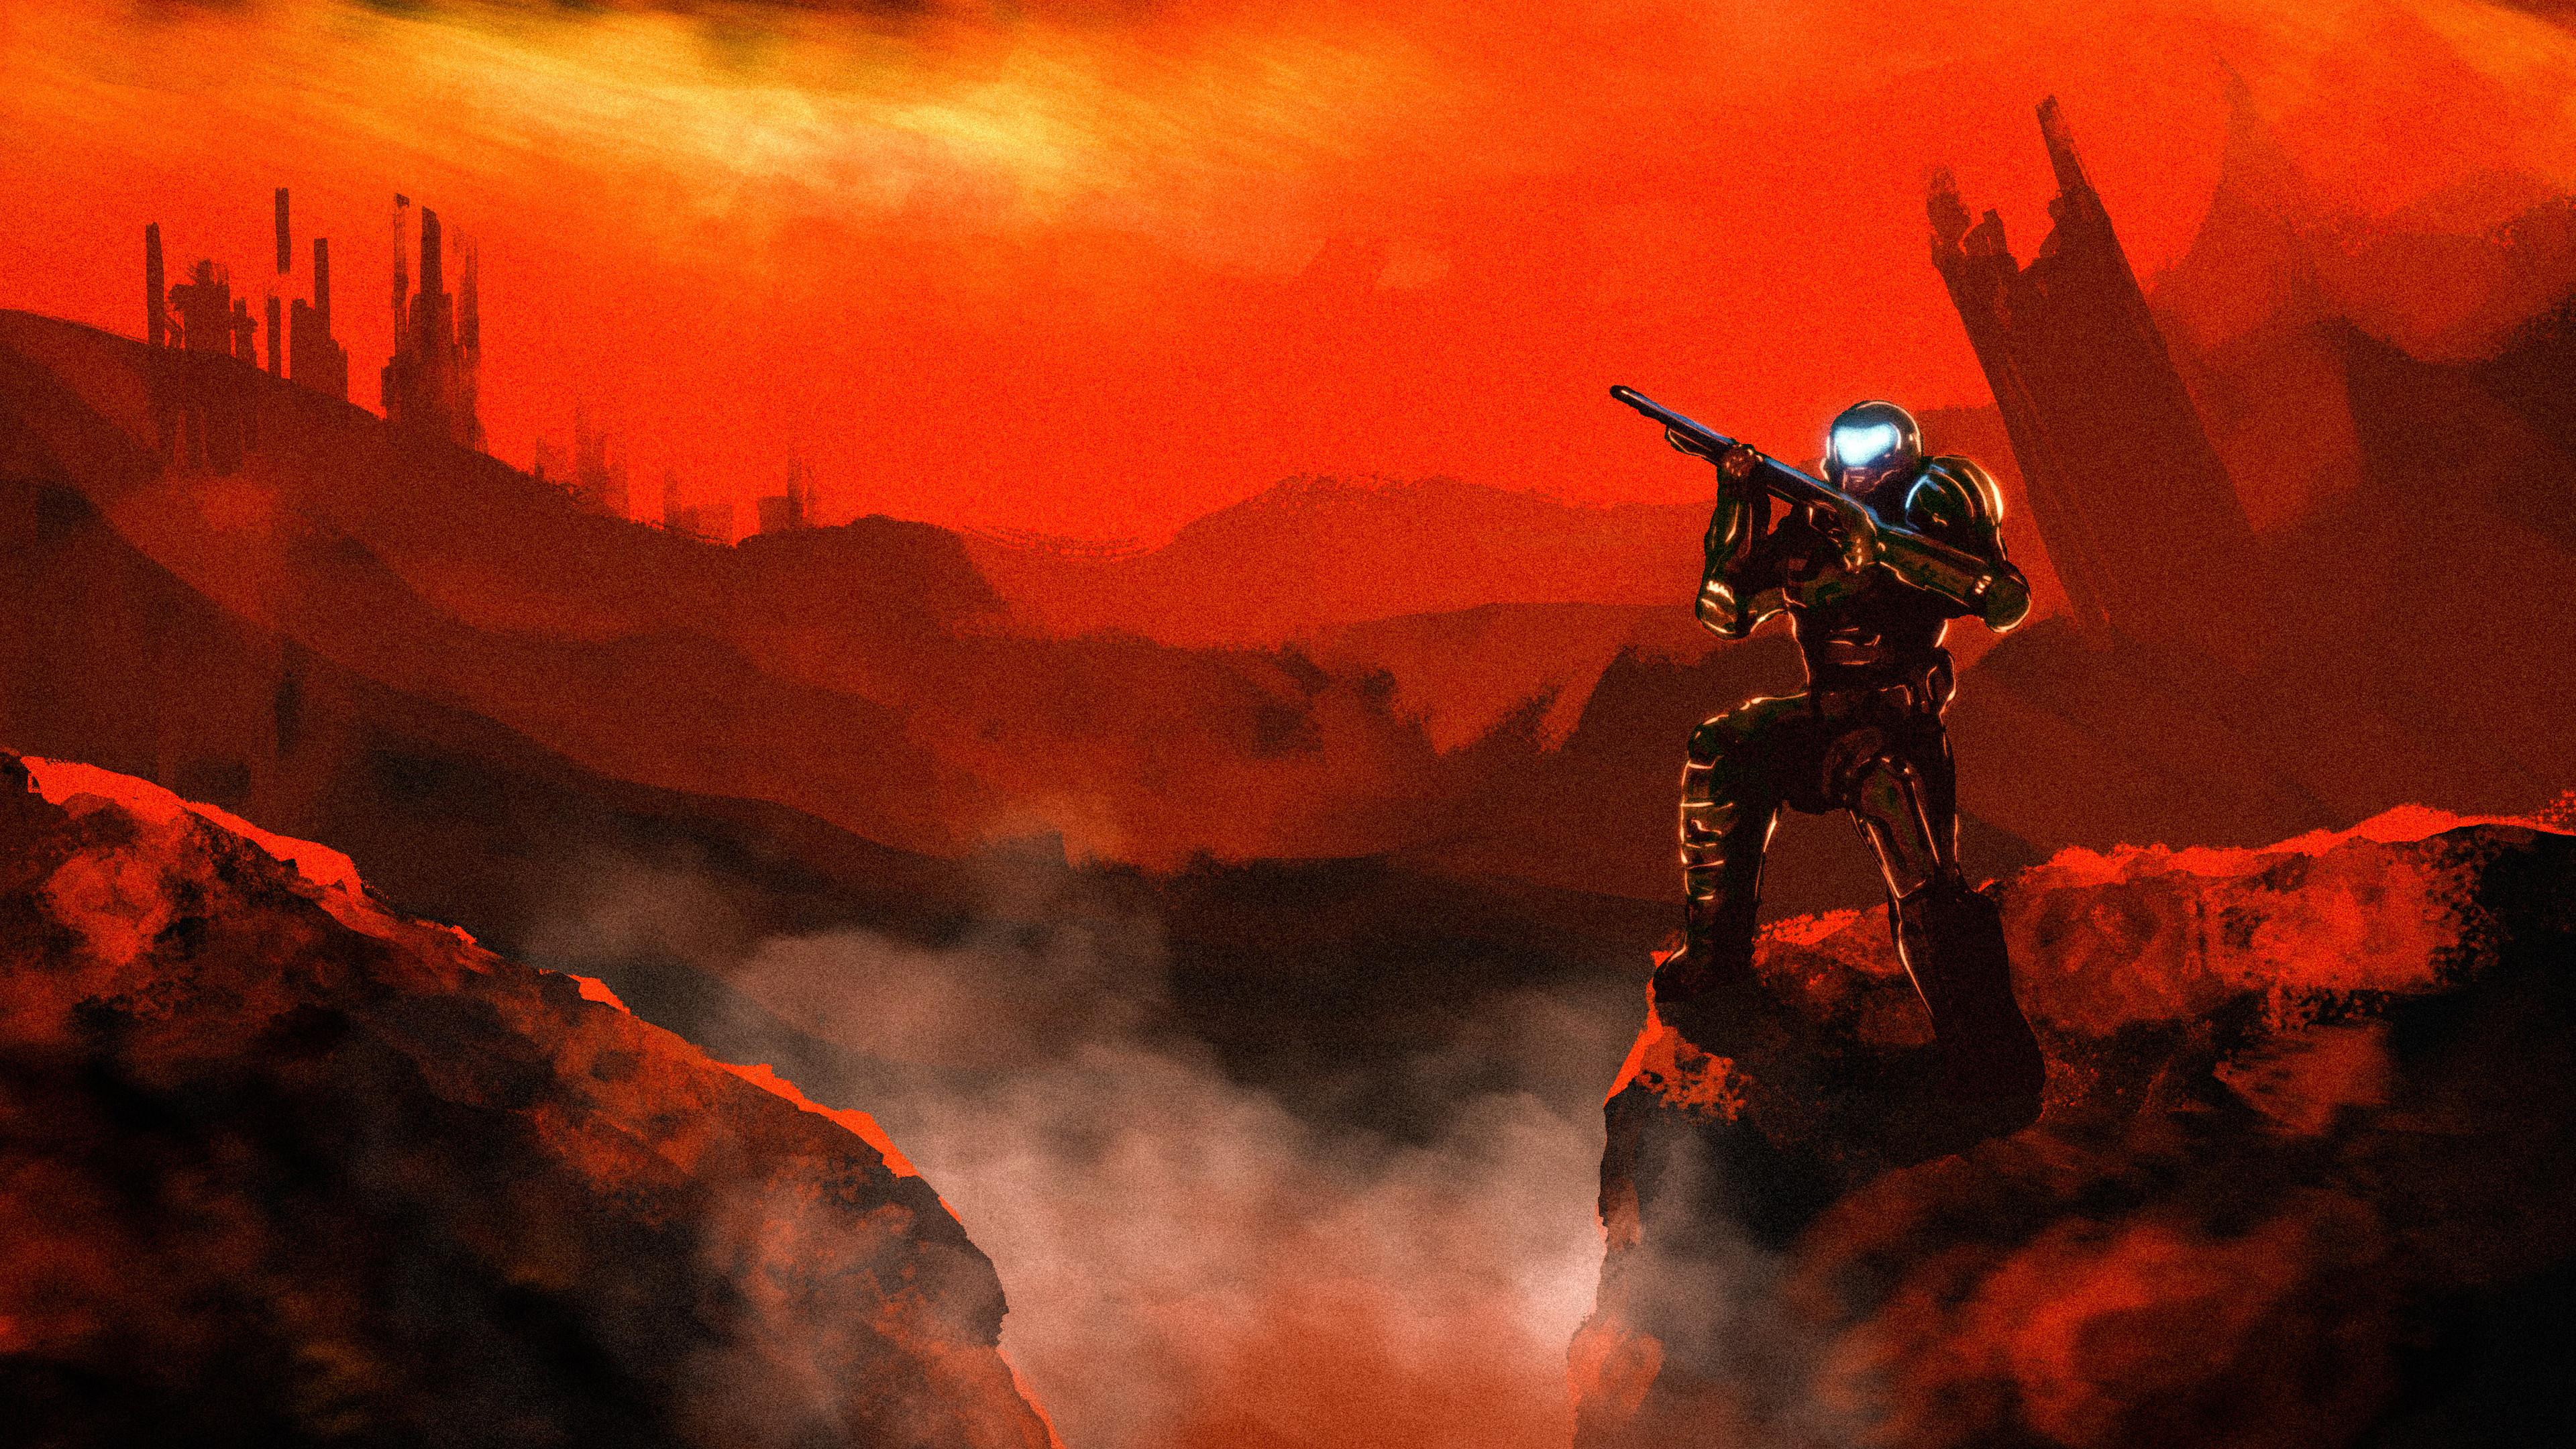 doom slayer 1581276533 - Doom Slayer - Doom Slayer wallpapers, Doom Slayer 4k wallpapers